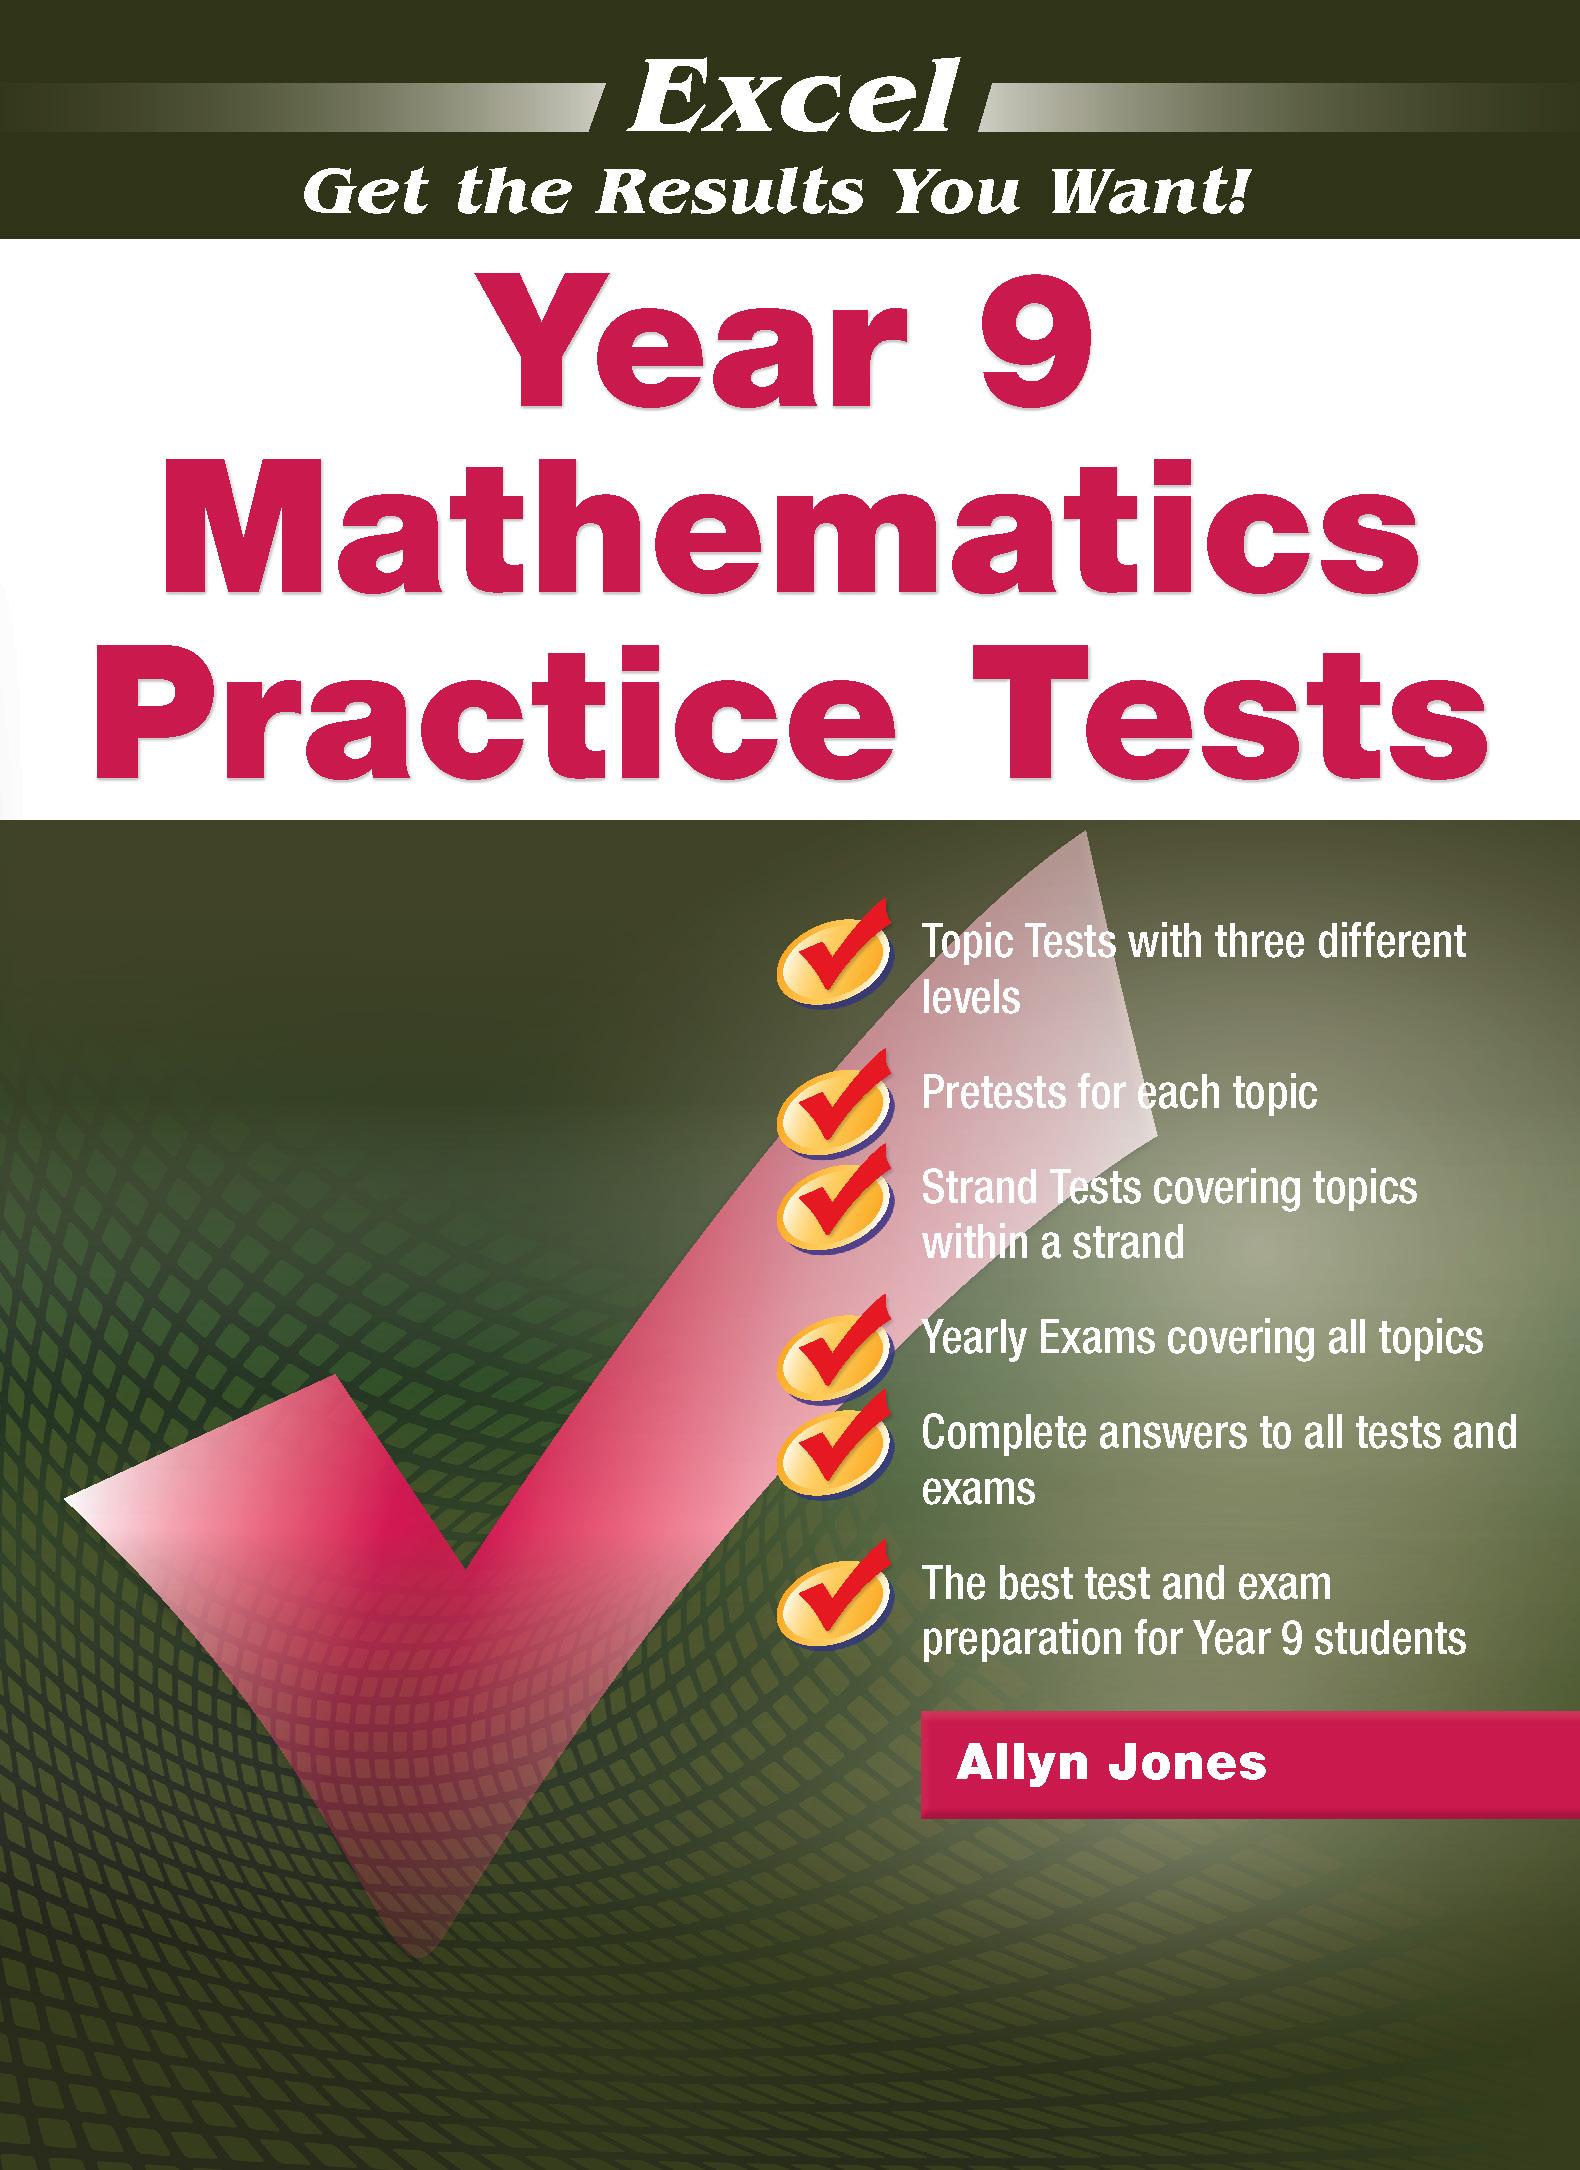 Excel Mathematics Practice Tests Year 9